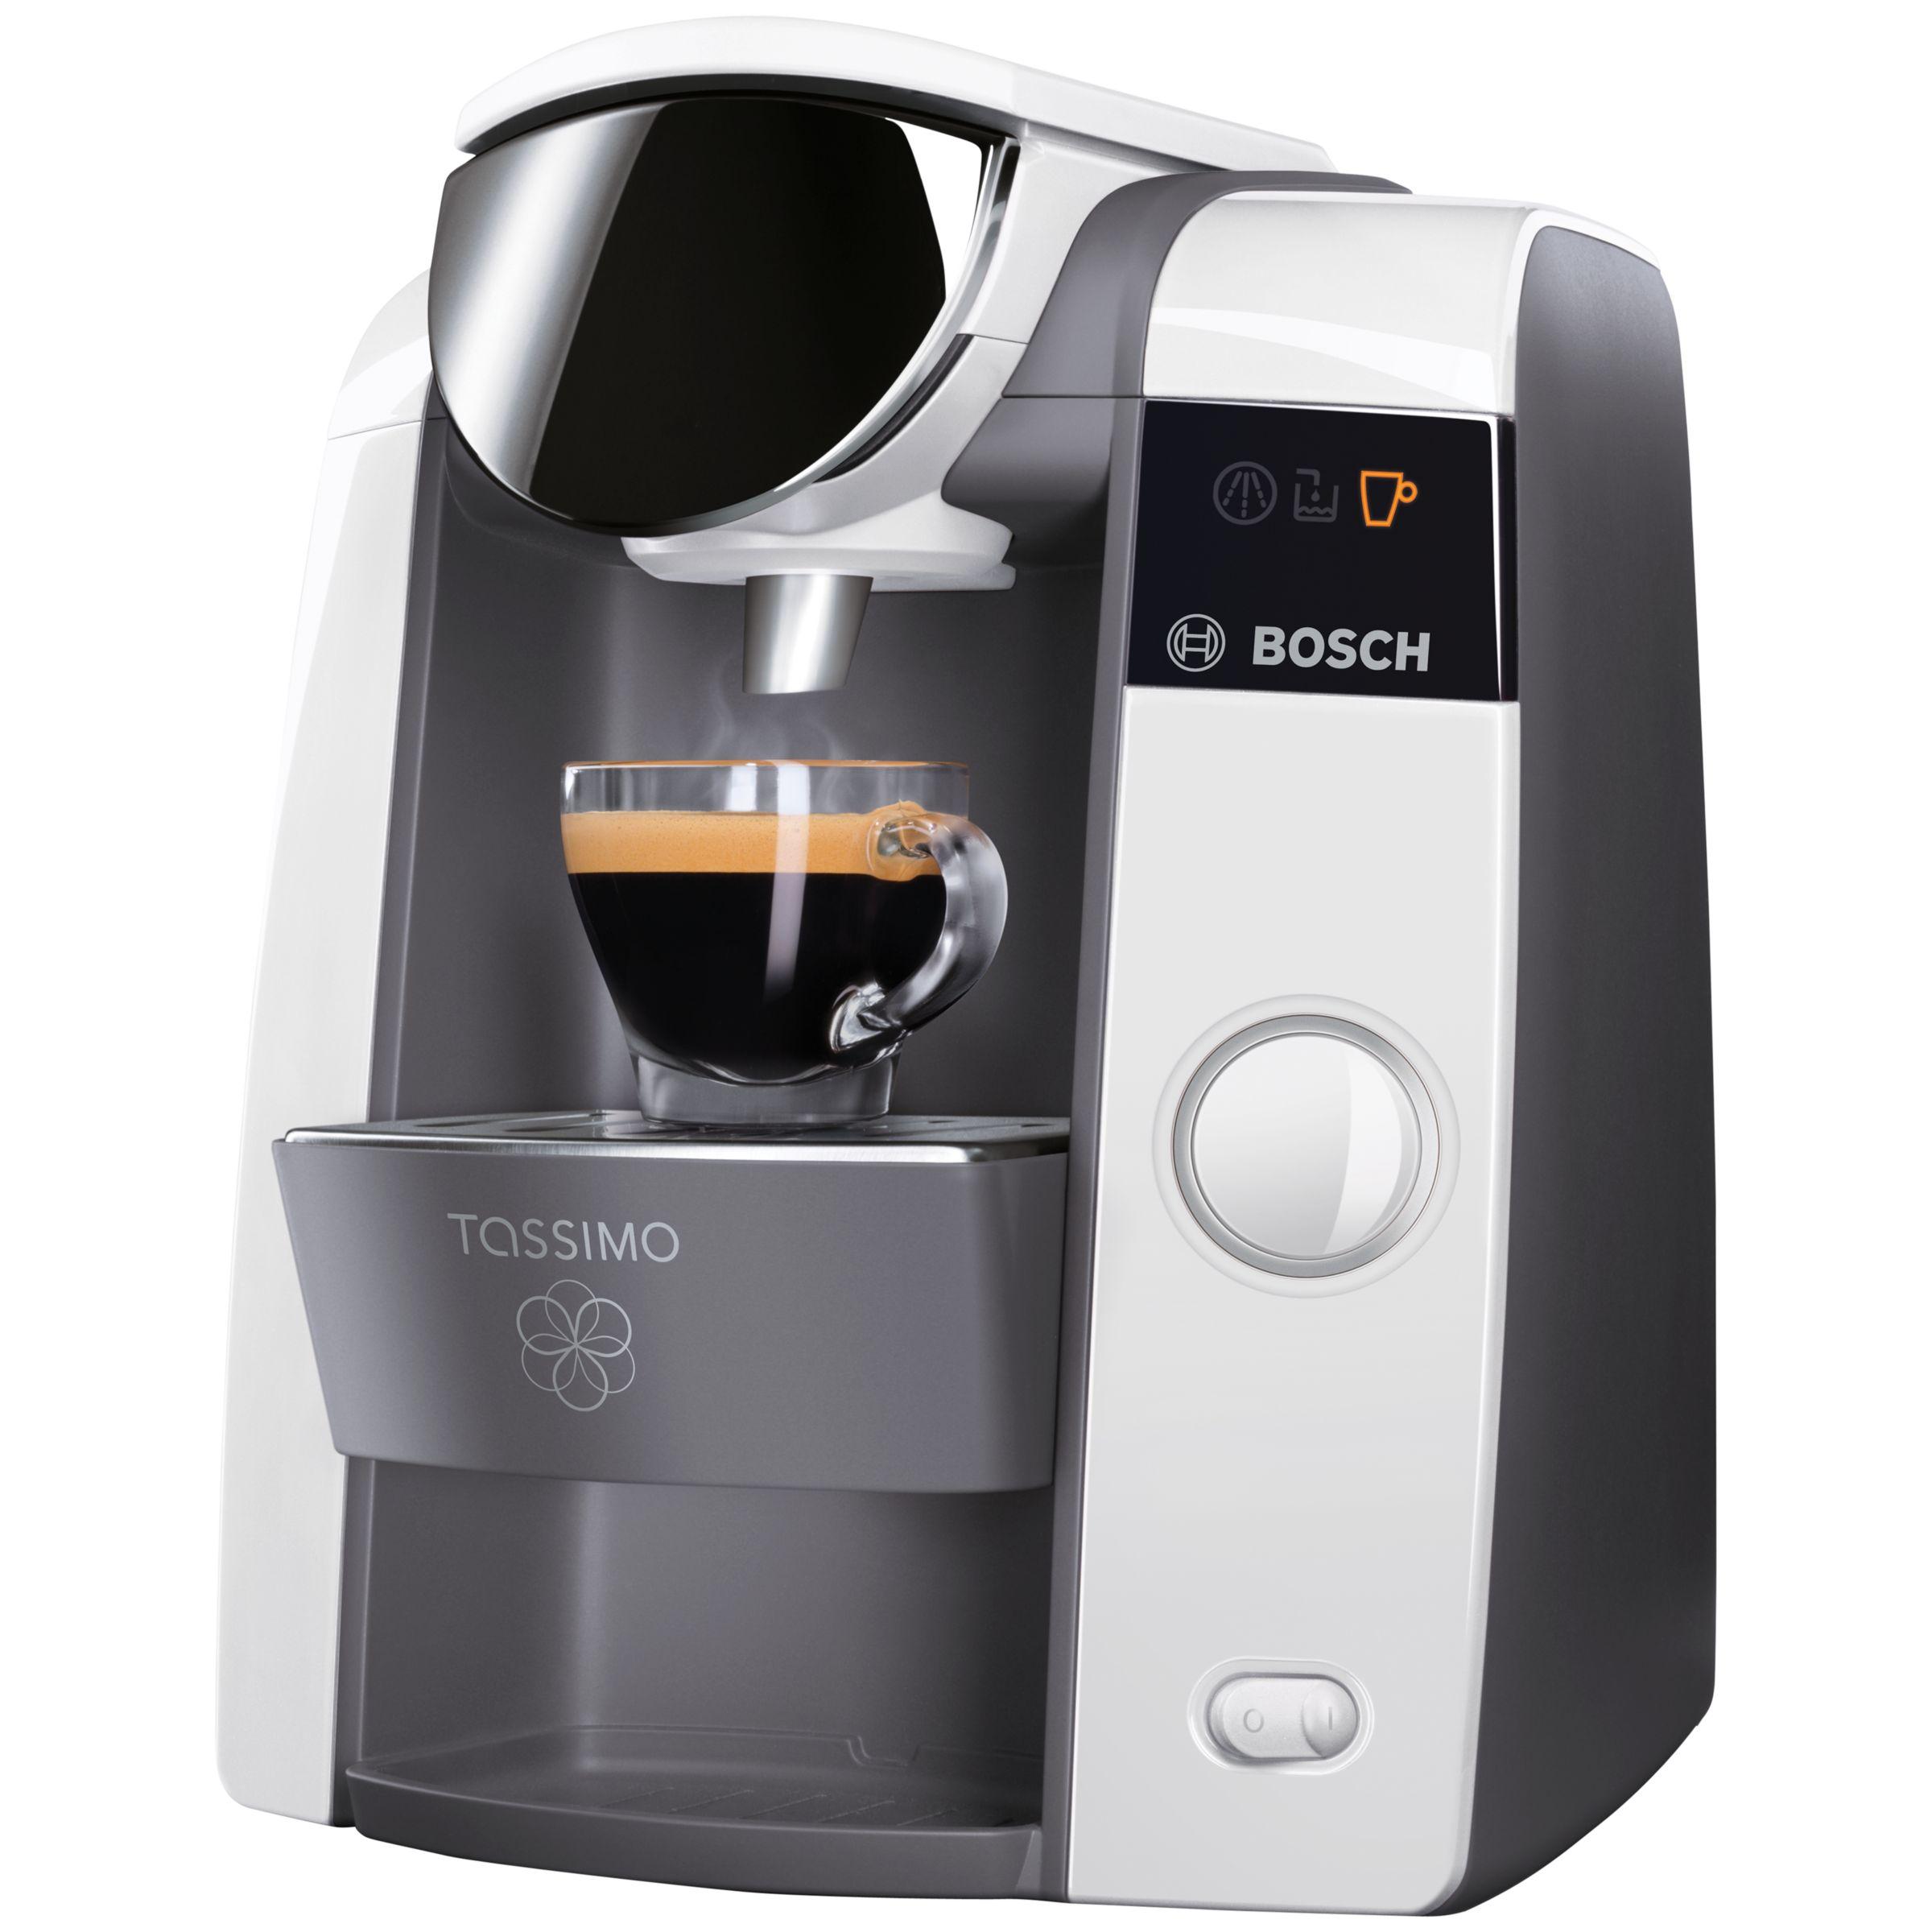 Buy Tassimo Joy Coffee Machine By Bosch, White John Lewis